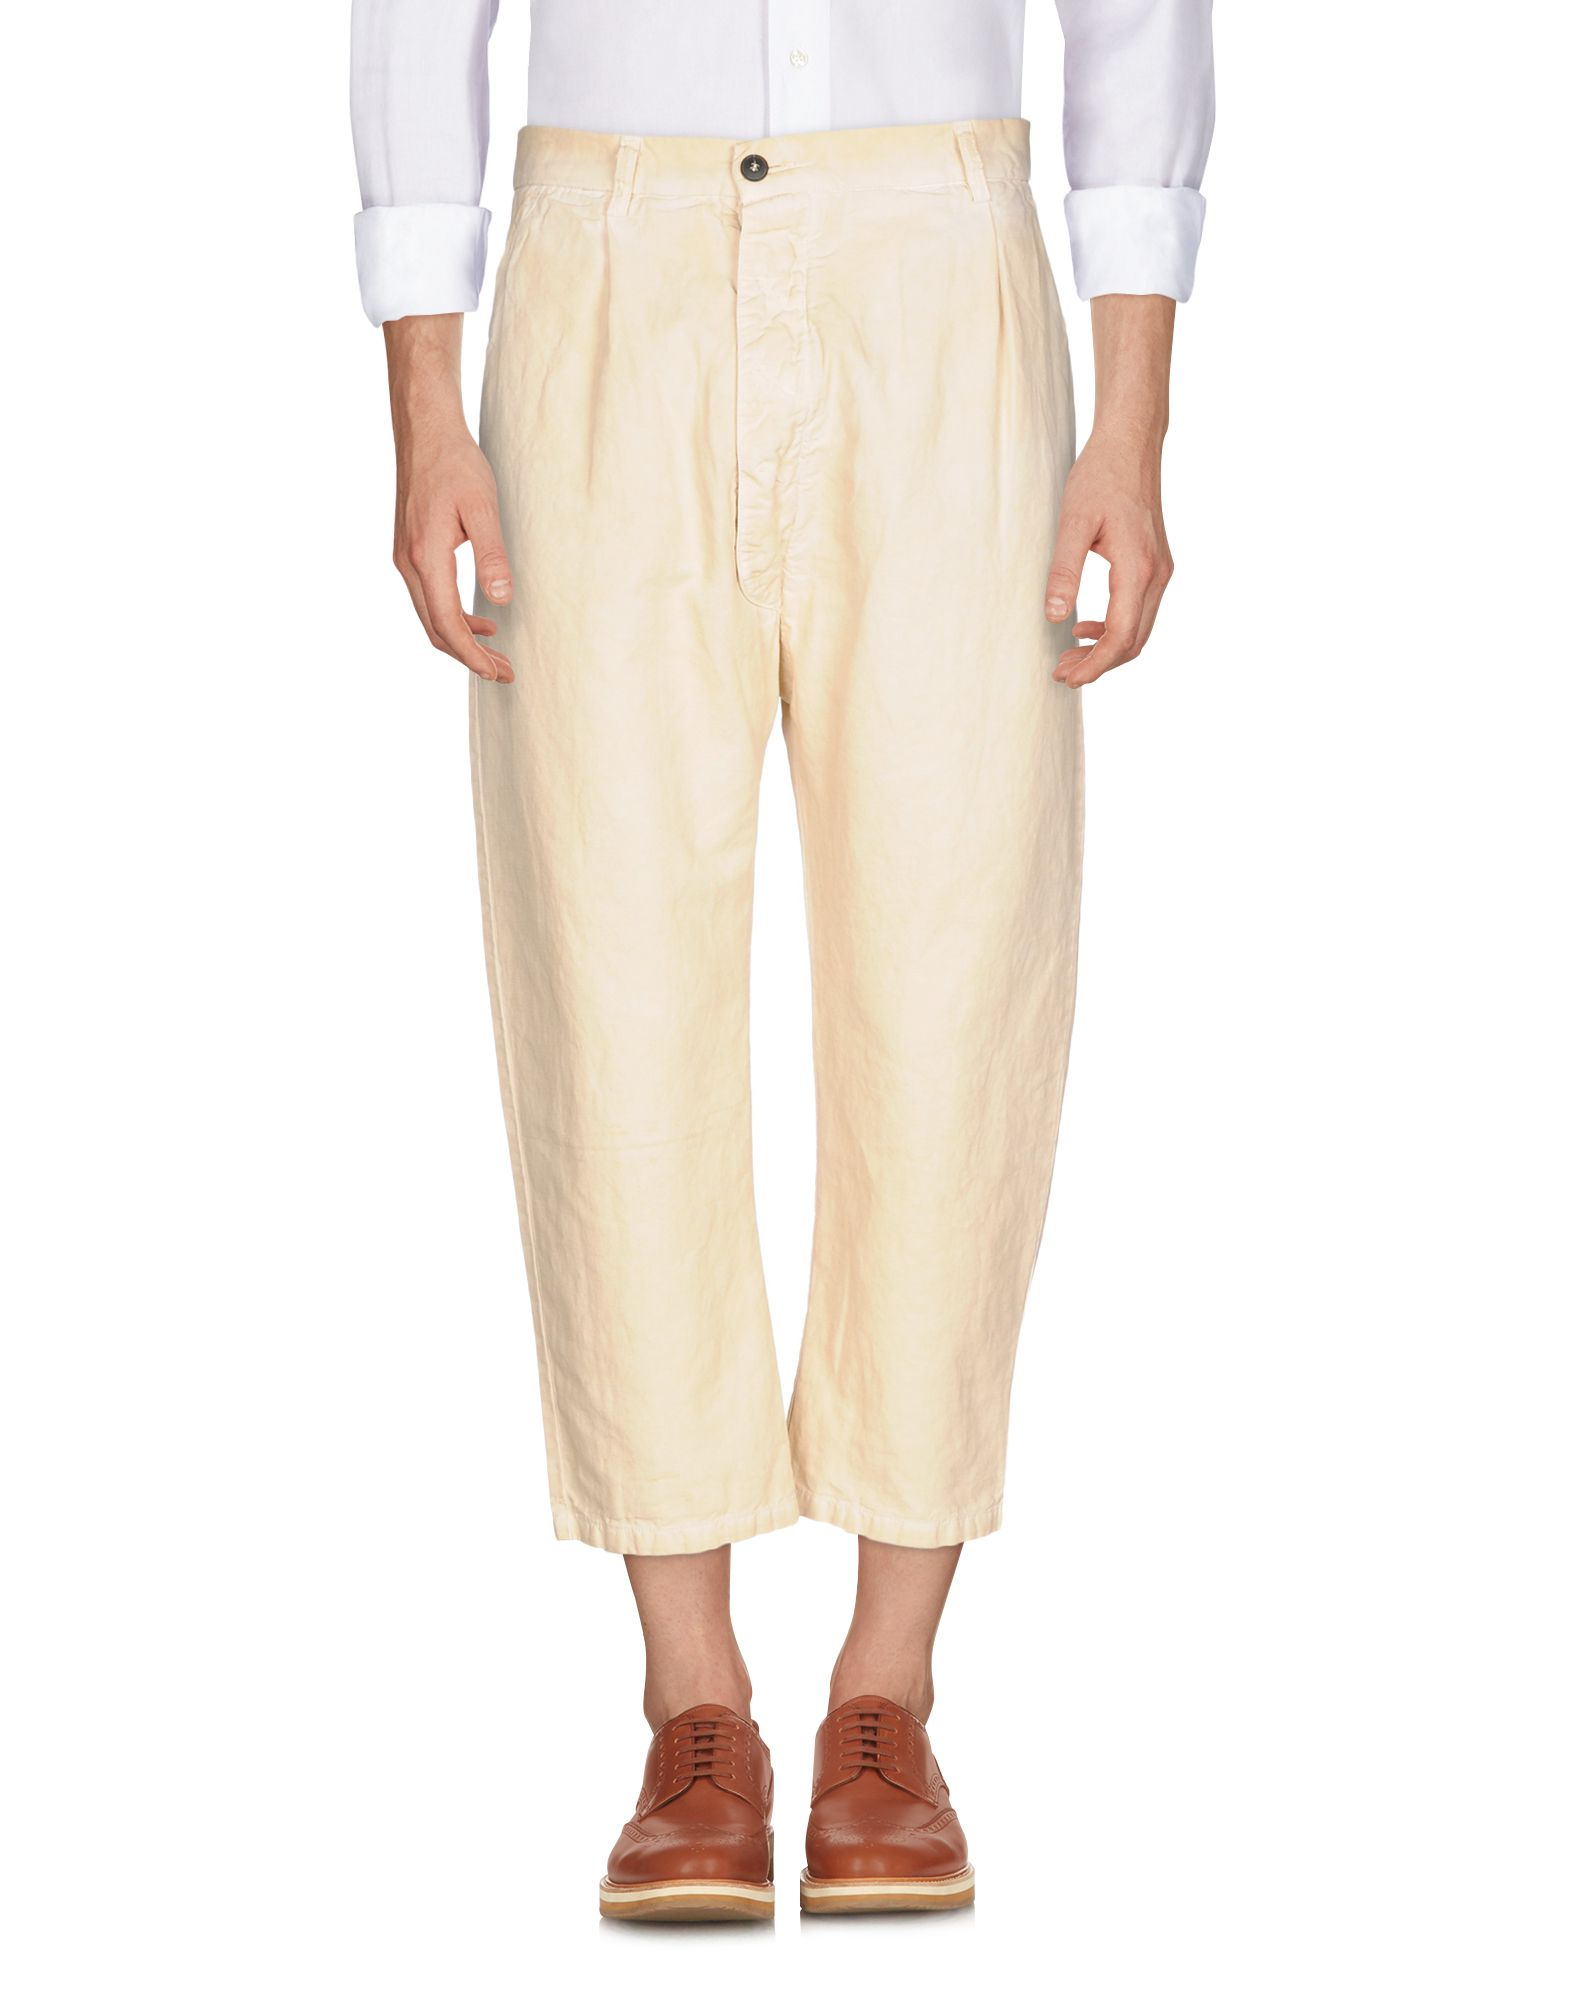 Pantalone Capri Nicolas & Mark Uomo - Acquista online su